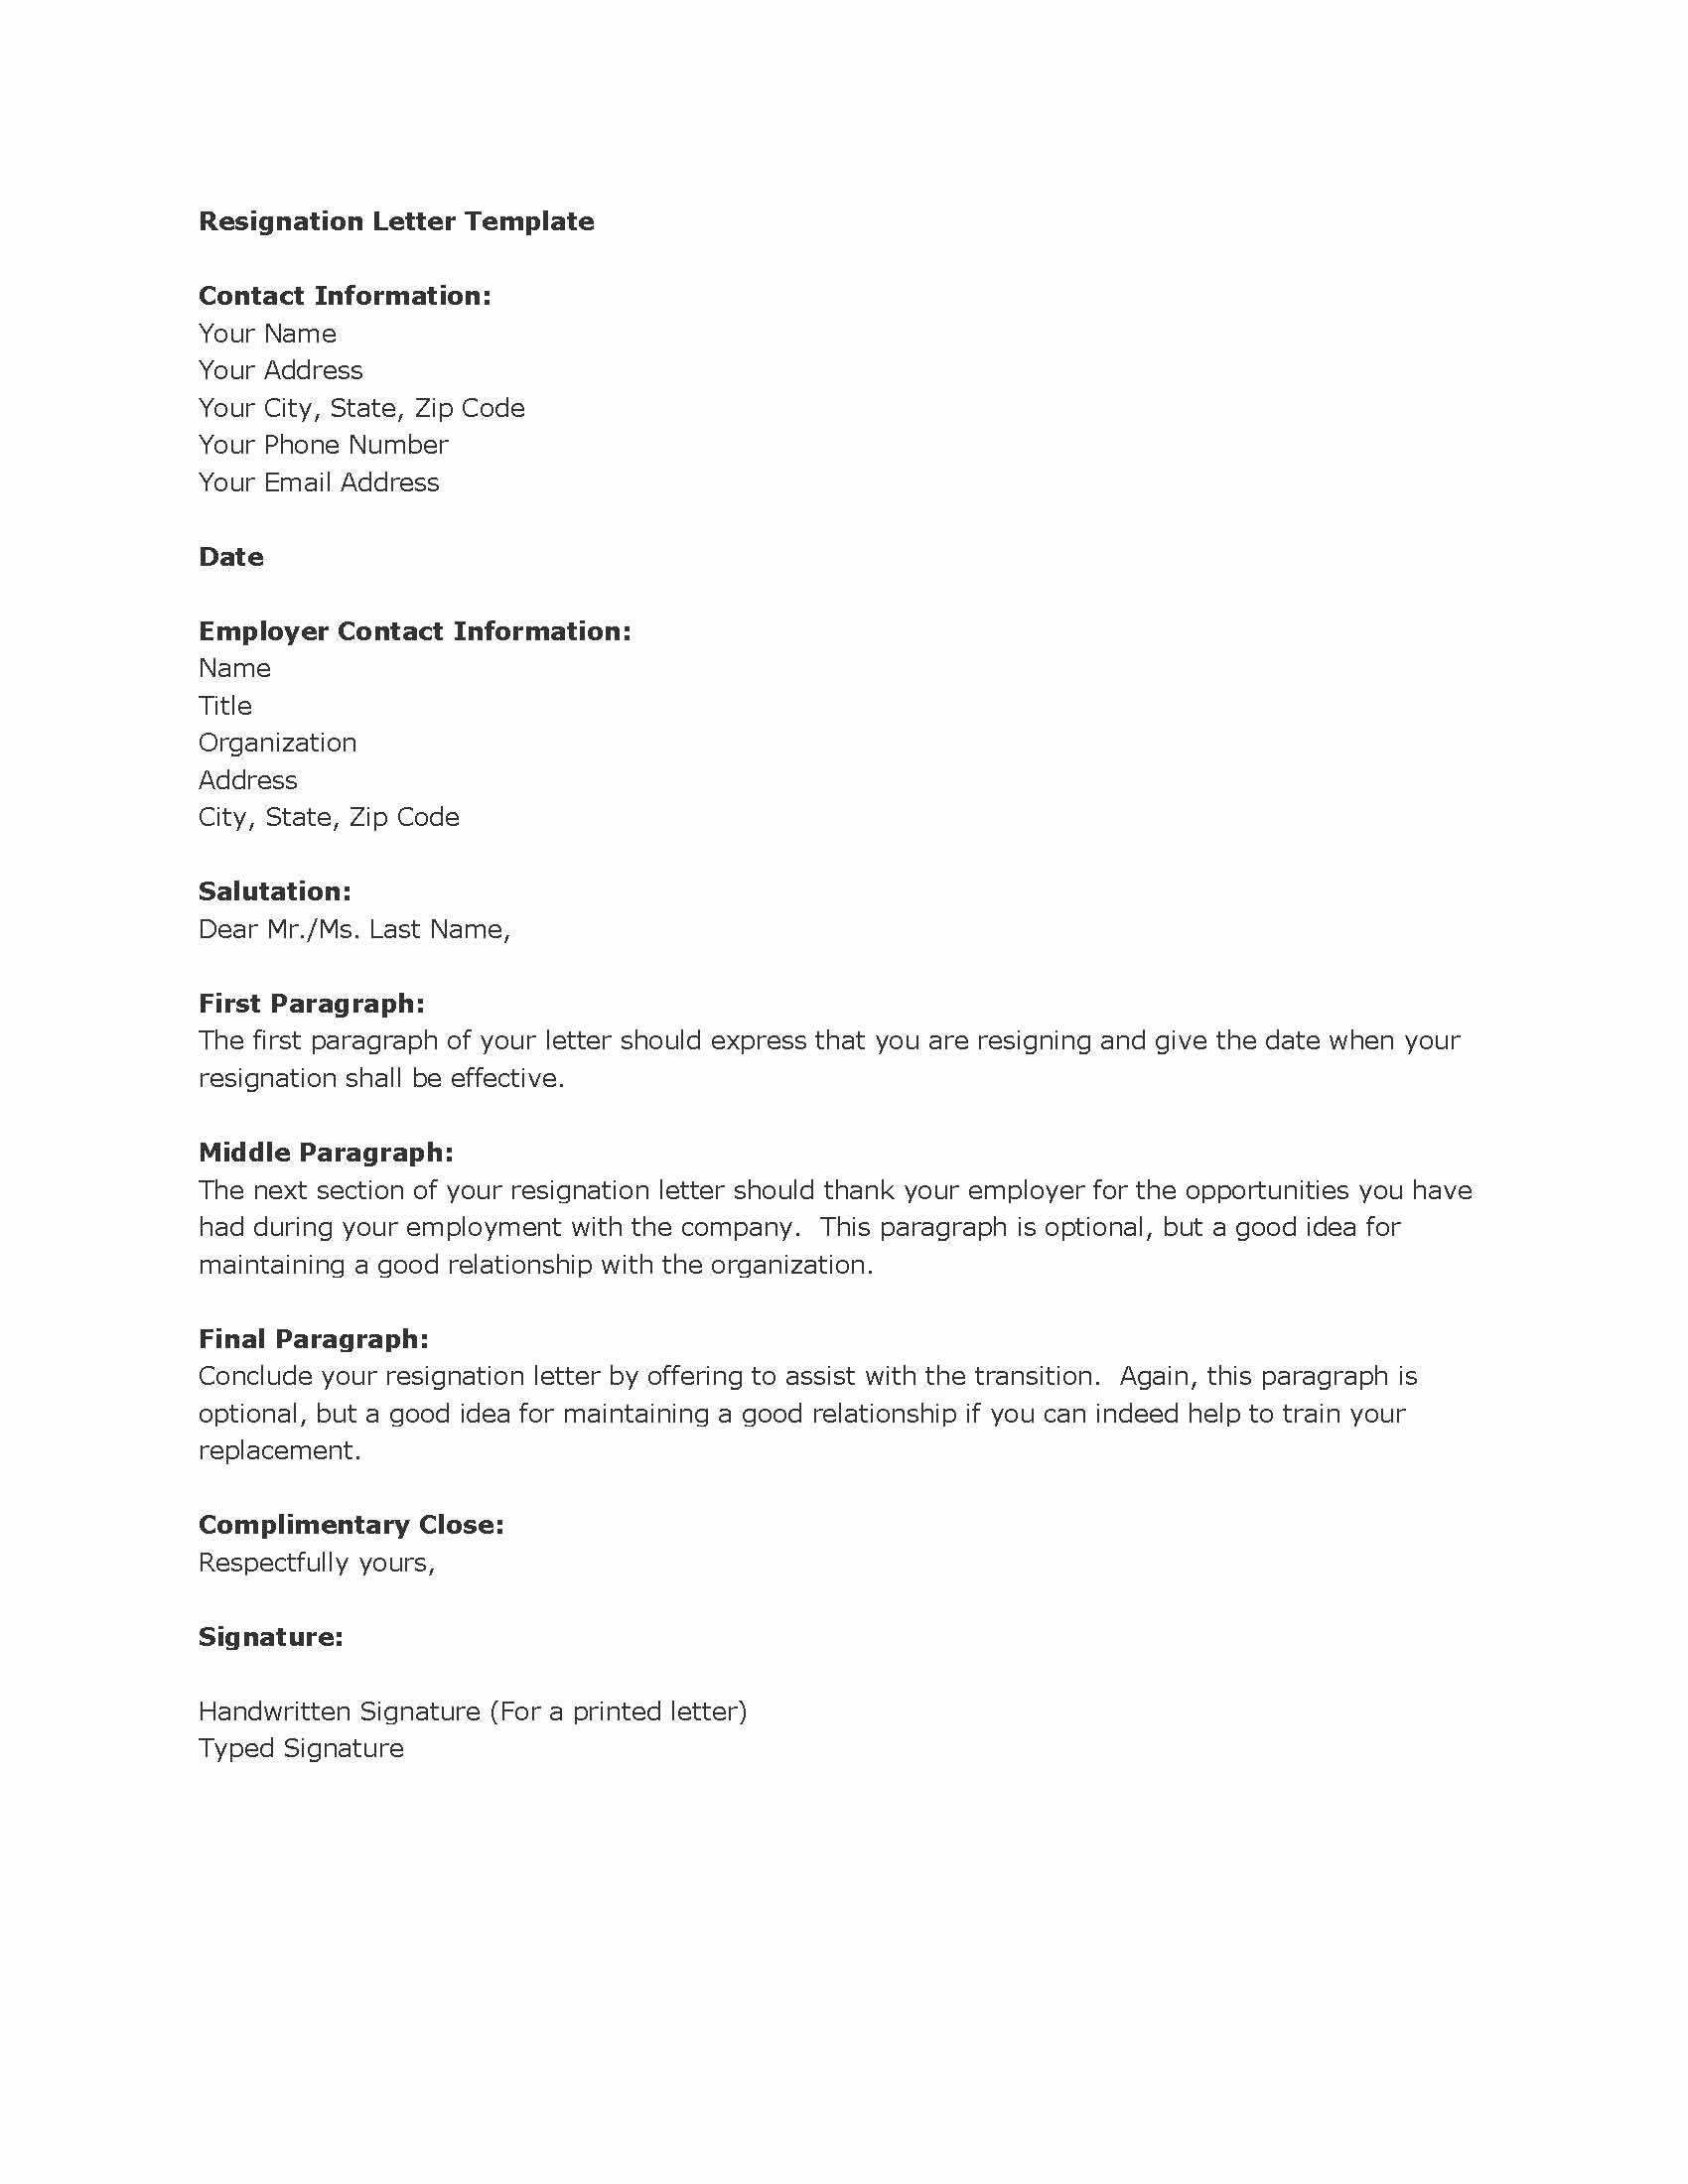 Letter Of Resignation Templates Fresh Resignation Letter Samples Download Pdf Doc format